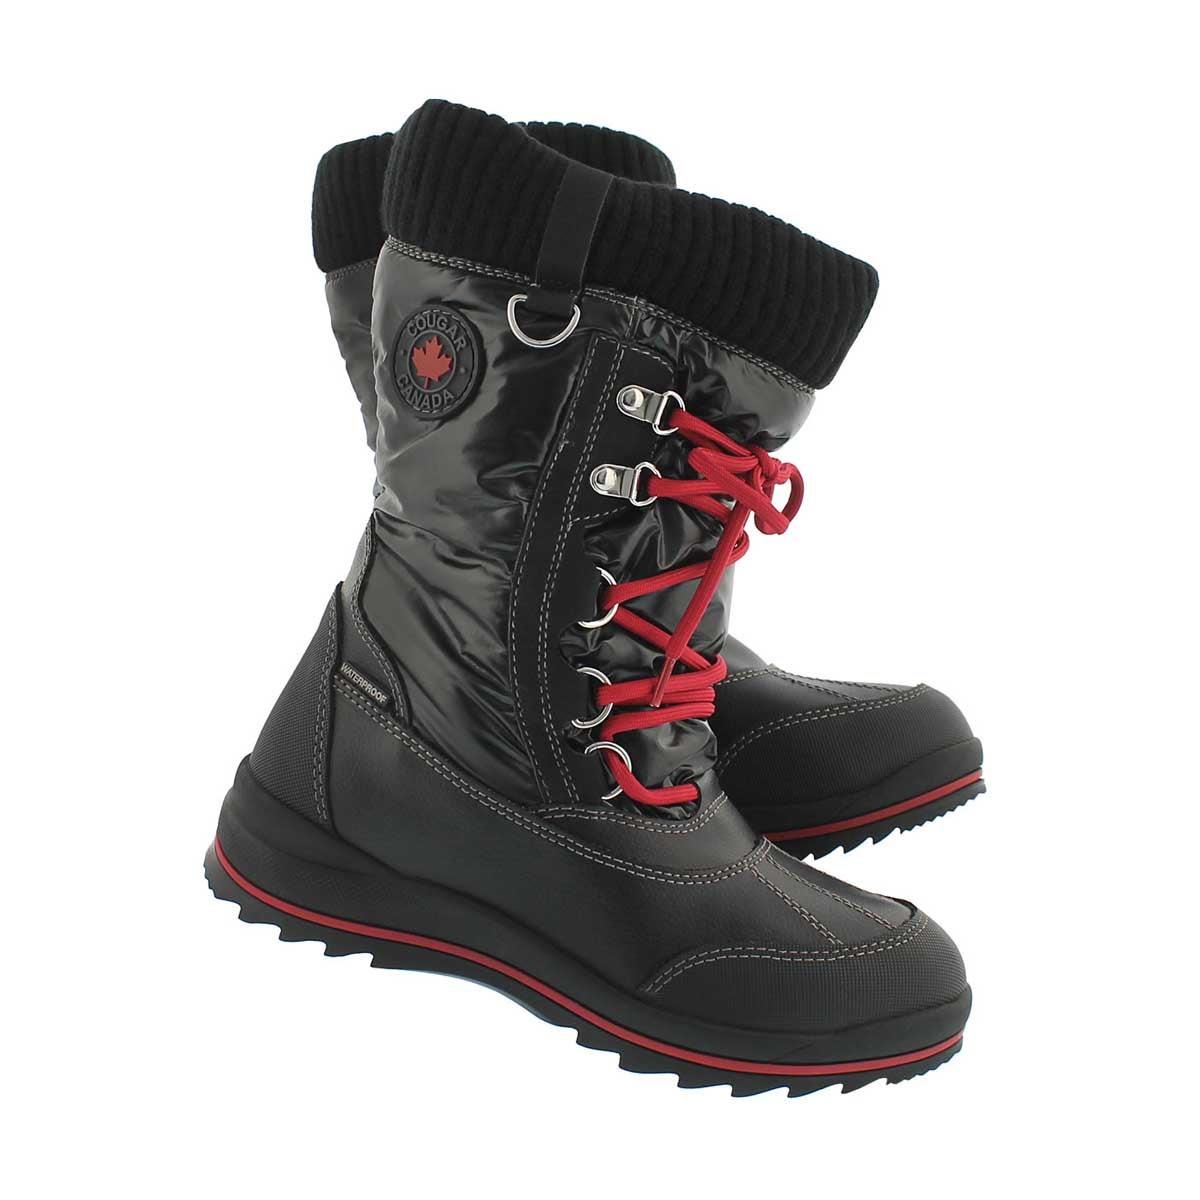 Grls Como black wtpf pull on winter boot